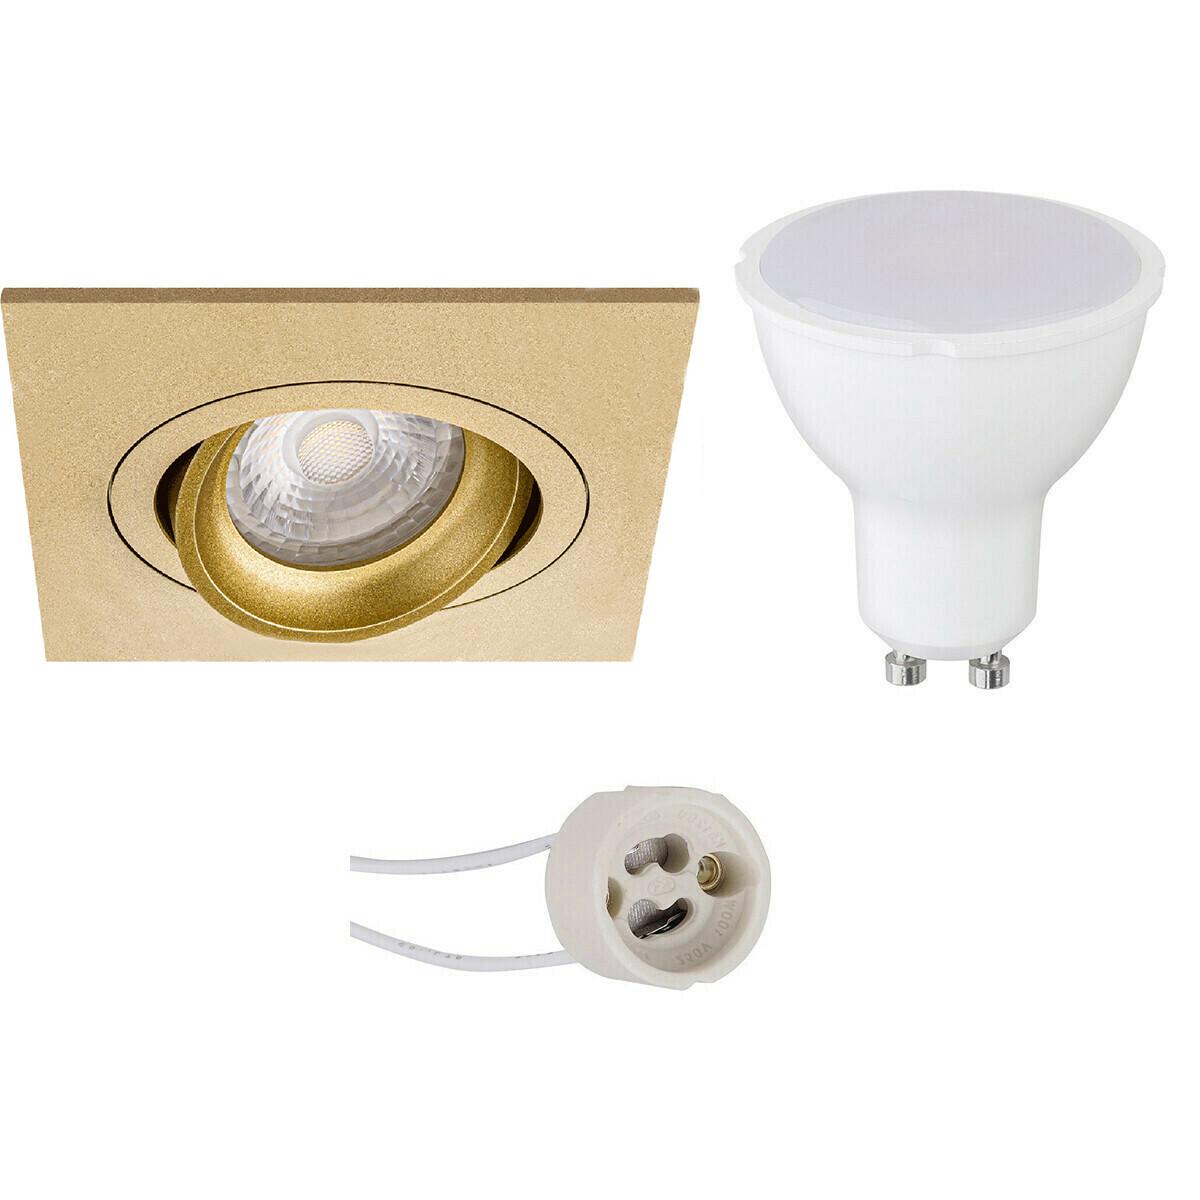 LED Spot Set - Pragmi Borny Pro - GU10 Fitting - Dimbaar - Inbouw Vierkant - Mat Goud - 6W - Natuurl